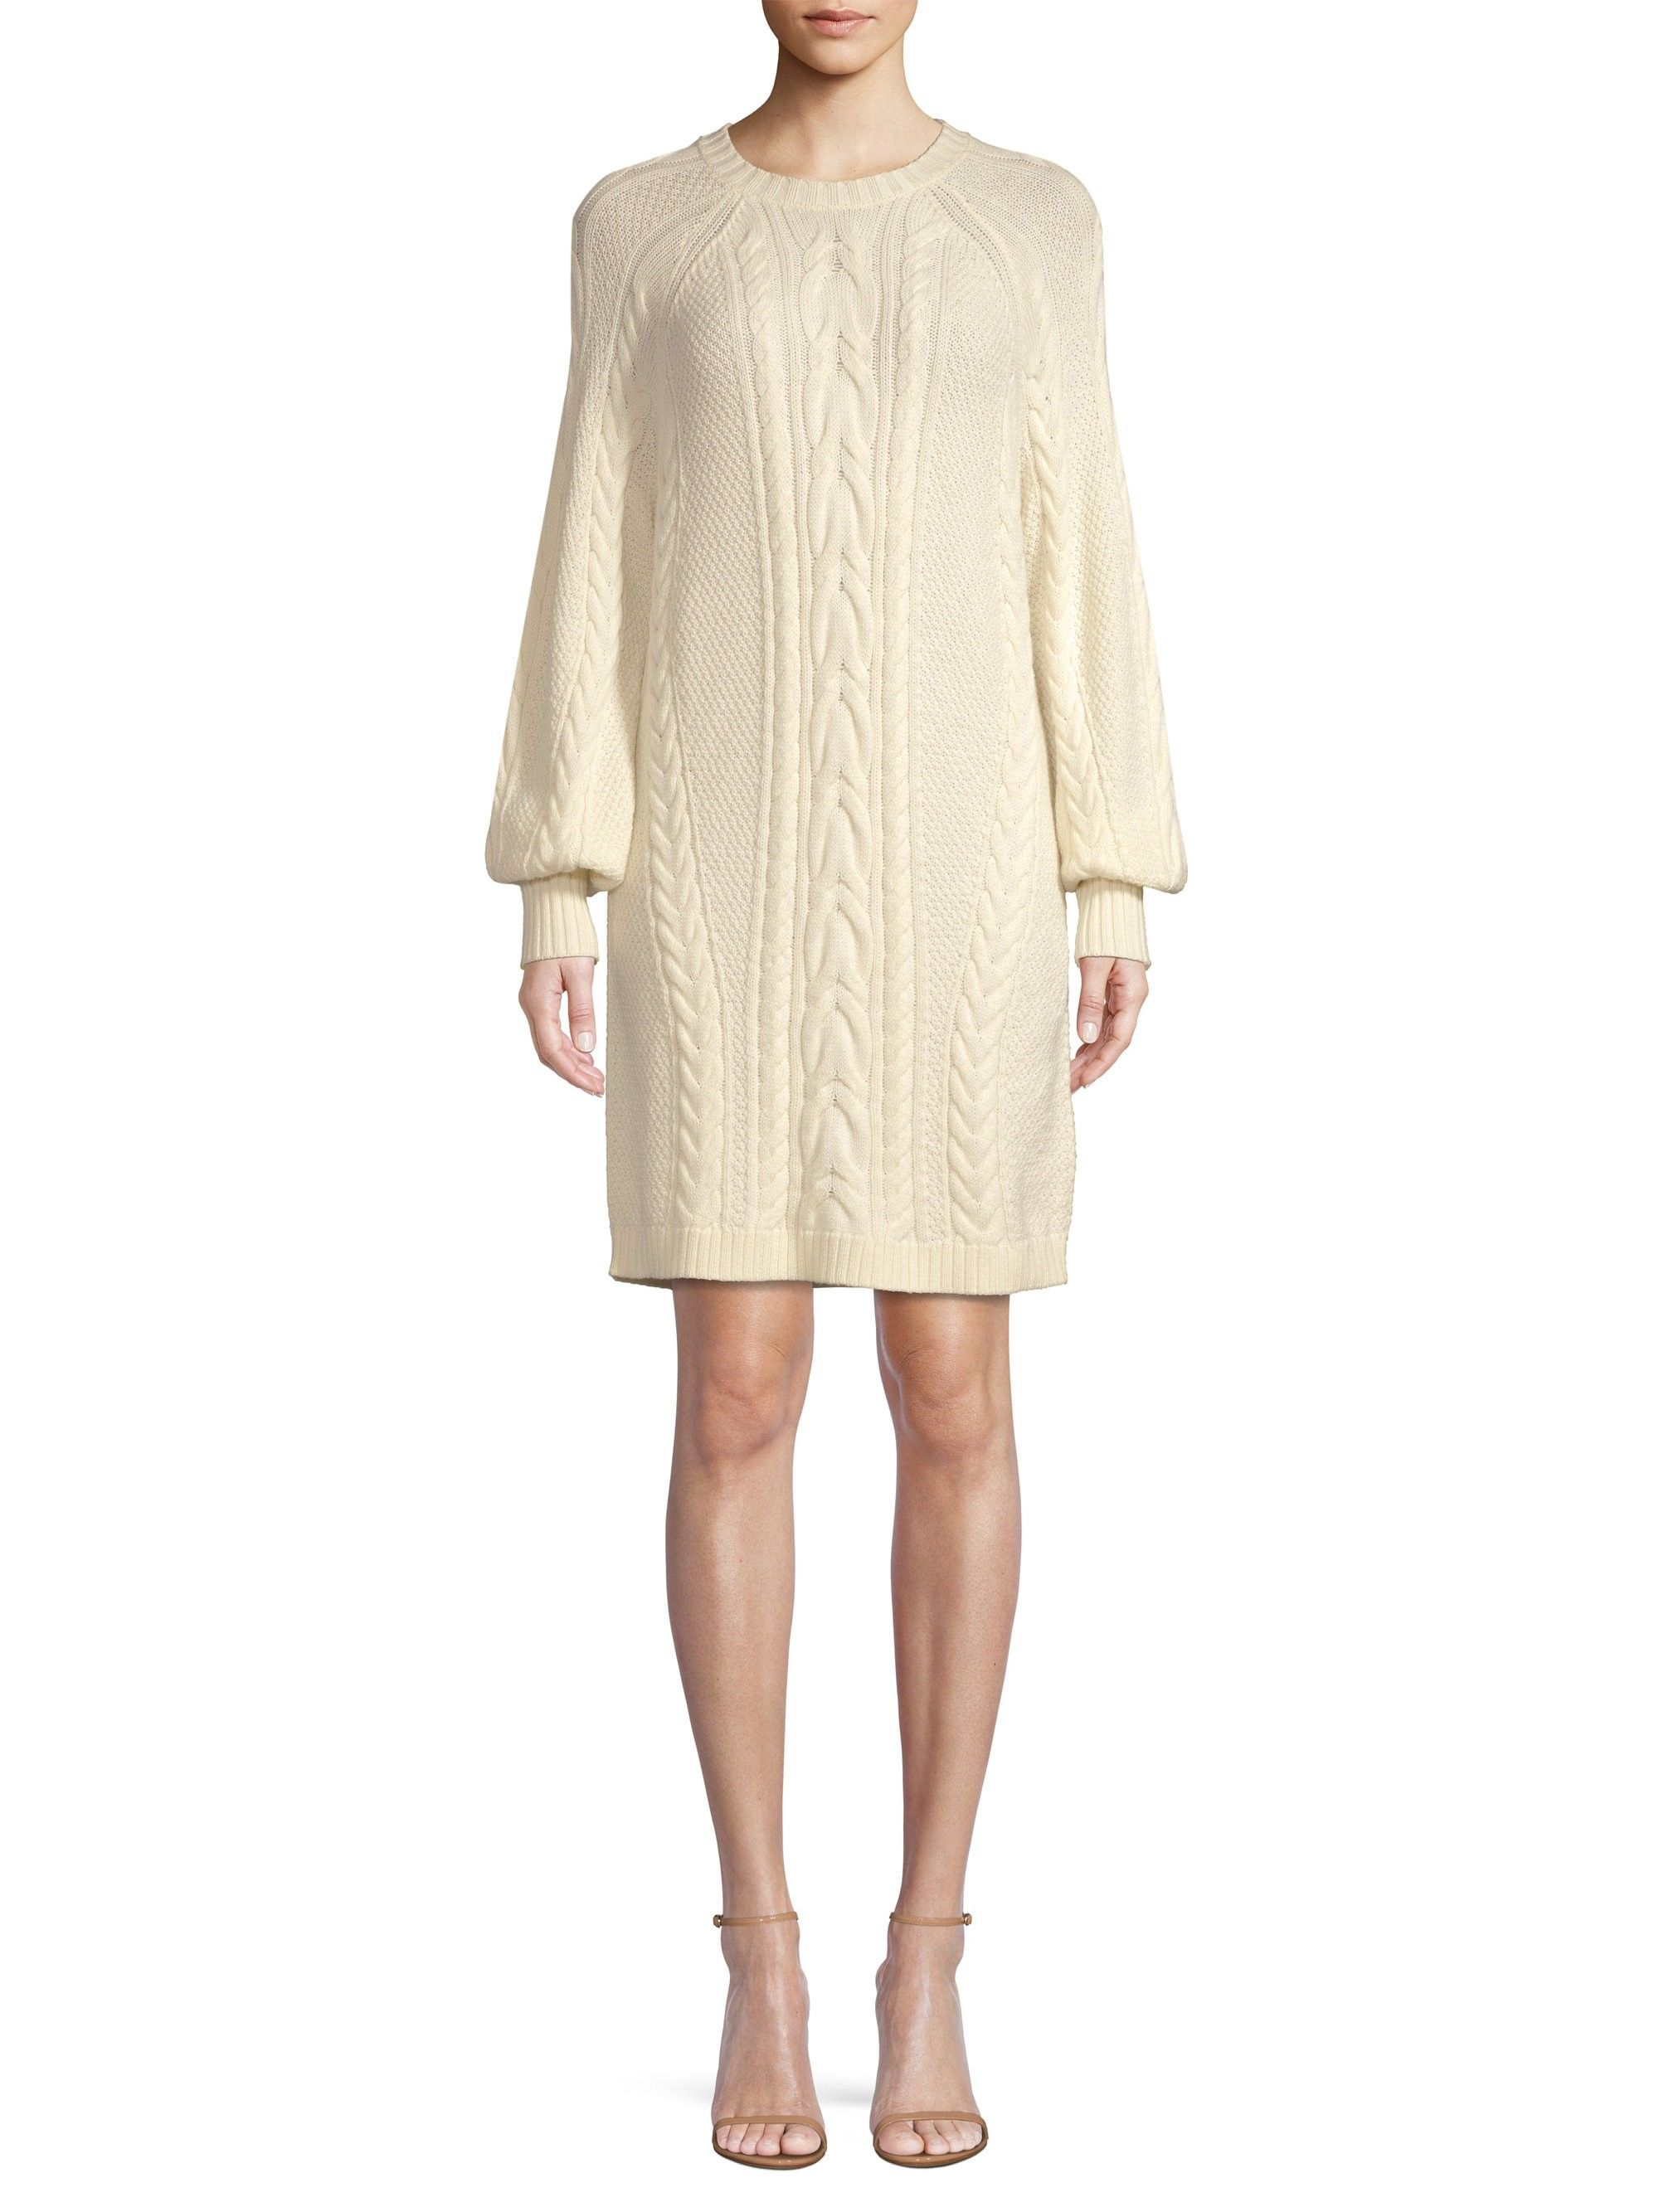 d0ab2472f8 Ralph Lauren Aran Cable-Knit Wool Shift Sweater Dress - Chic Cream X-Large